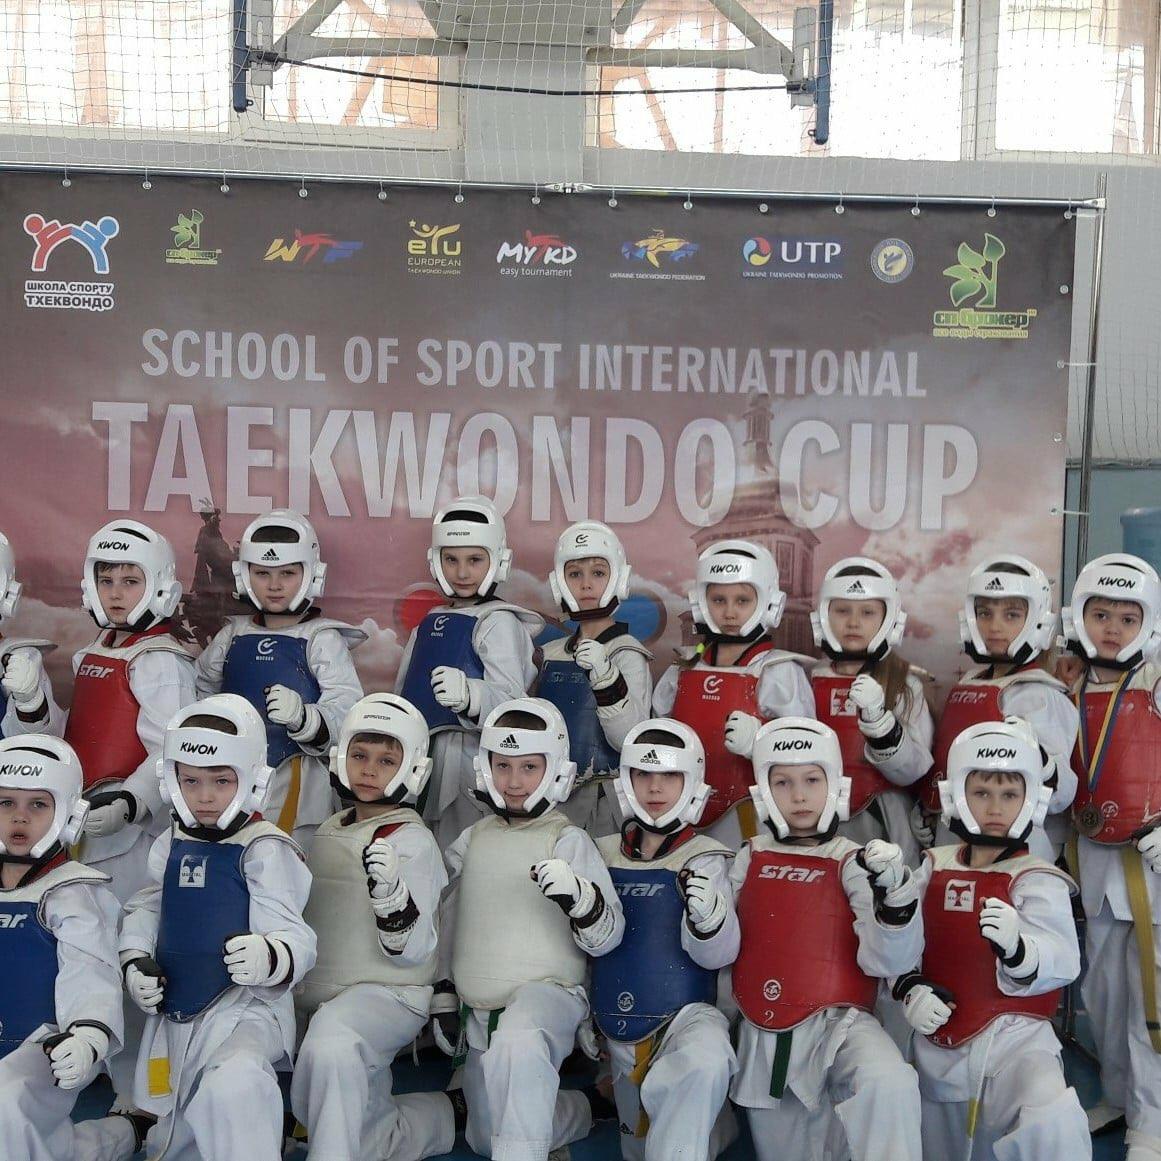 Барановичские спортсмены и их тренер Аида Оразаева (крайняя справа). Все фото: БФСО